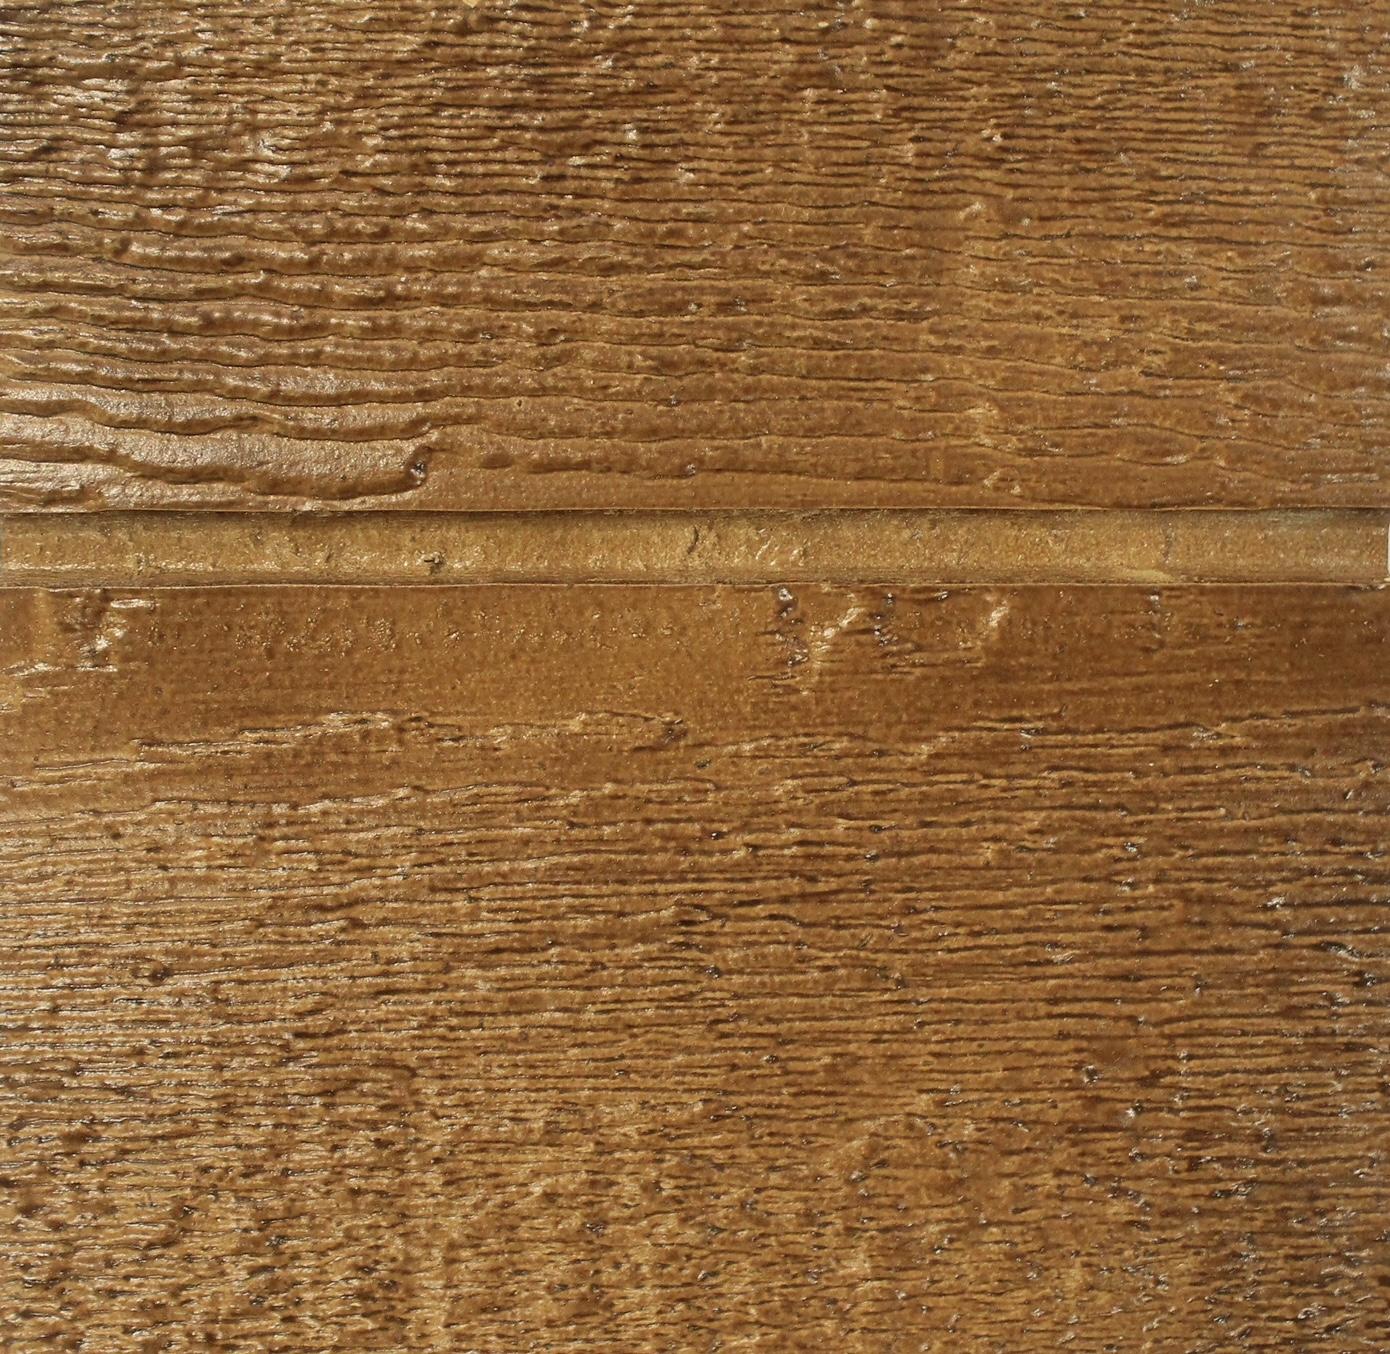 https://0901.nccdn.net/4_2/000/000/017/e75/chestnut-brown.jpg